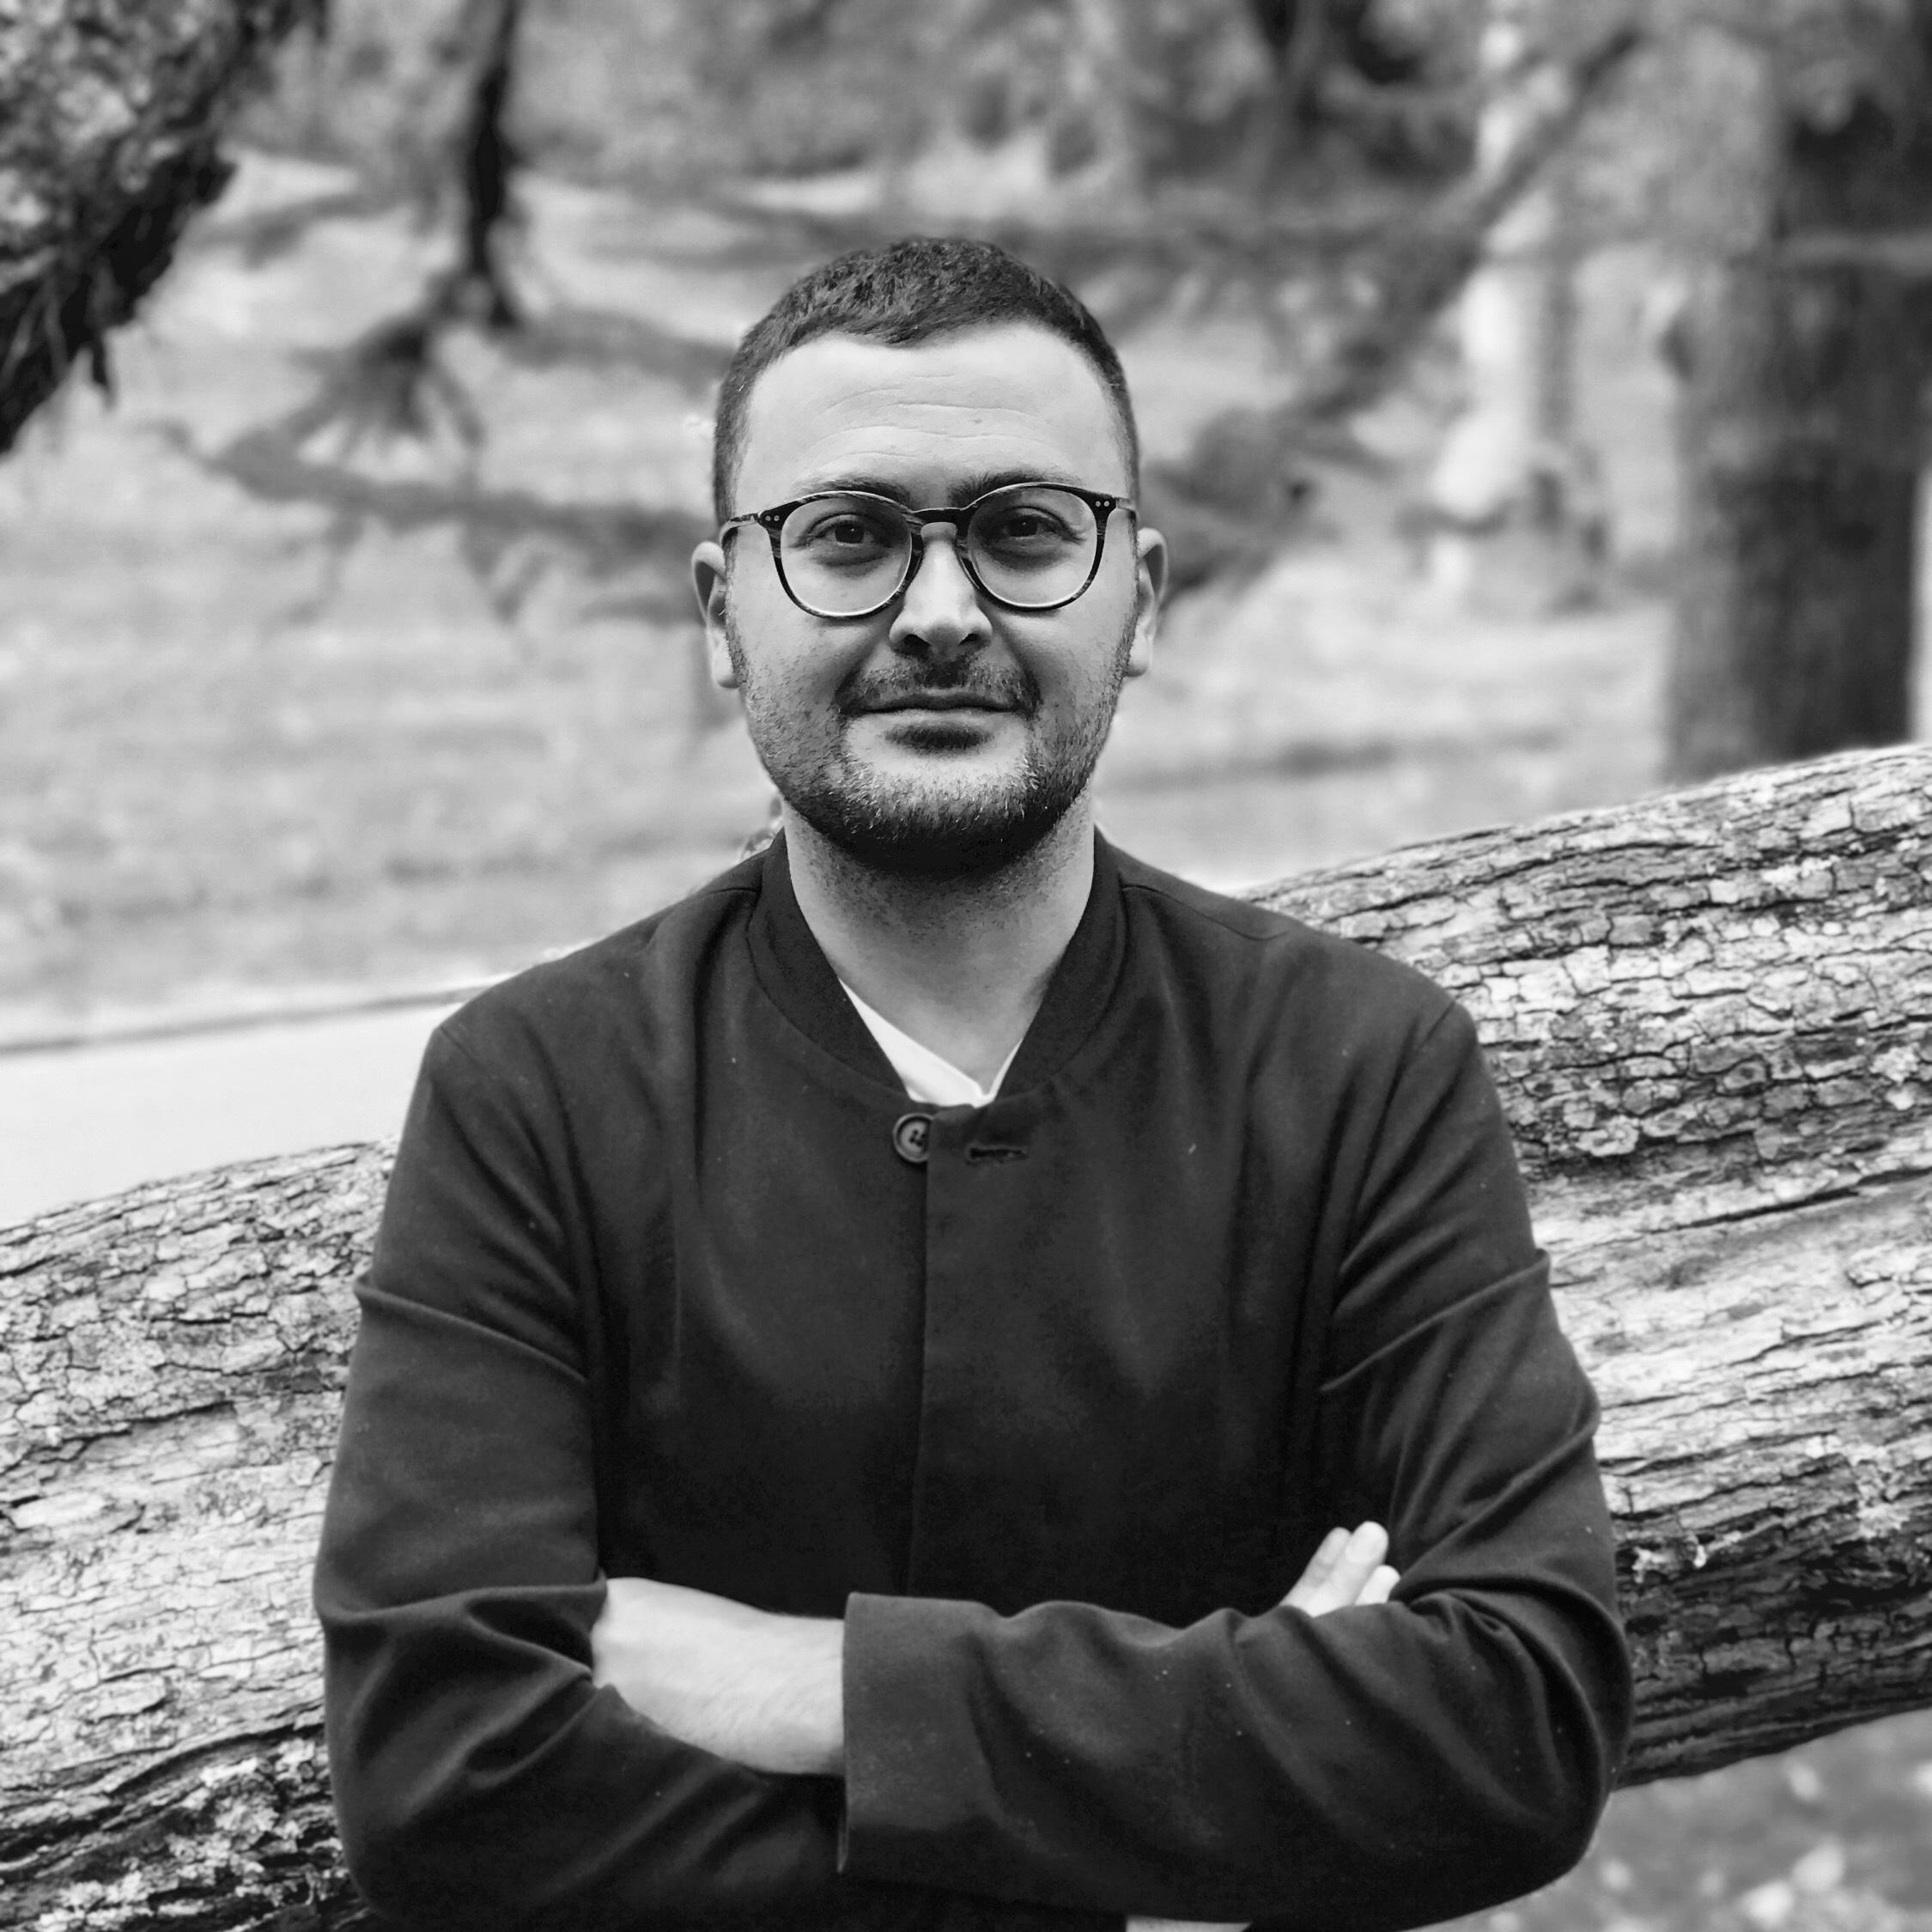 Misal Adnan Yıldız   is a curator, writer, and educator. Yıldız is the former director of Artspace NZ in Auckland in New Zealand  >>